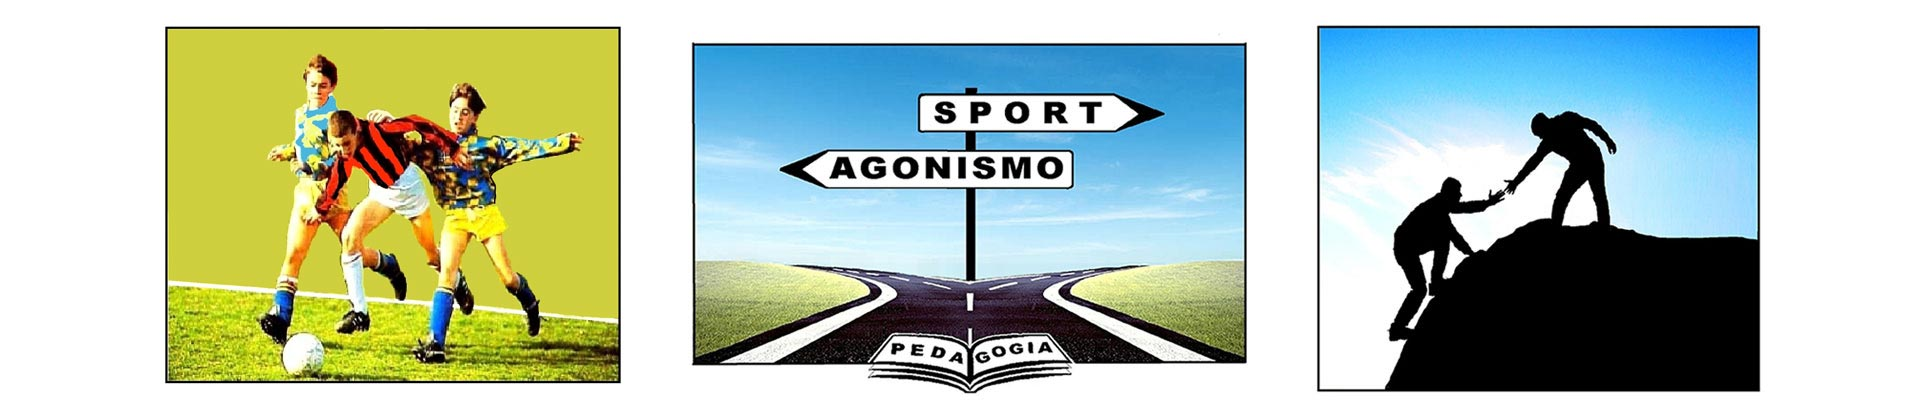 Sport - Agonismo